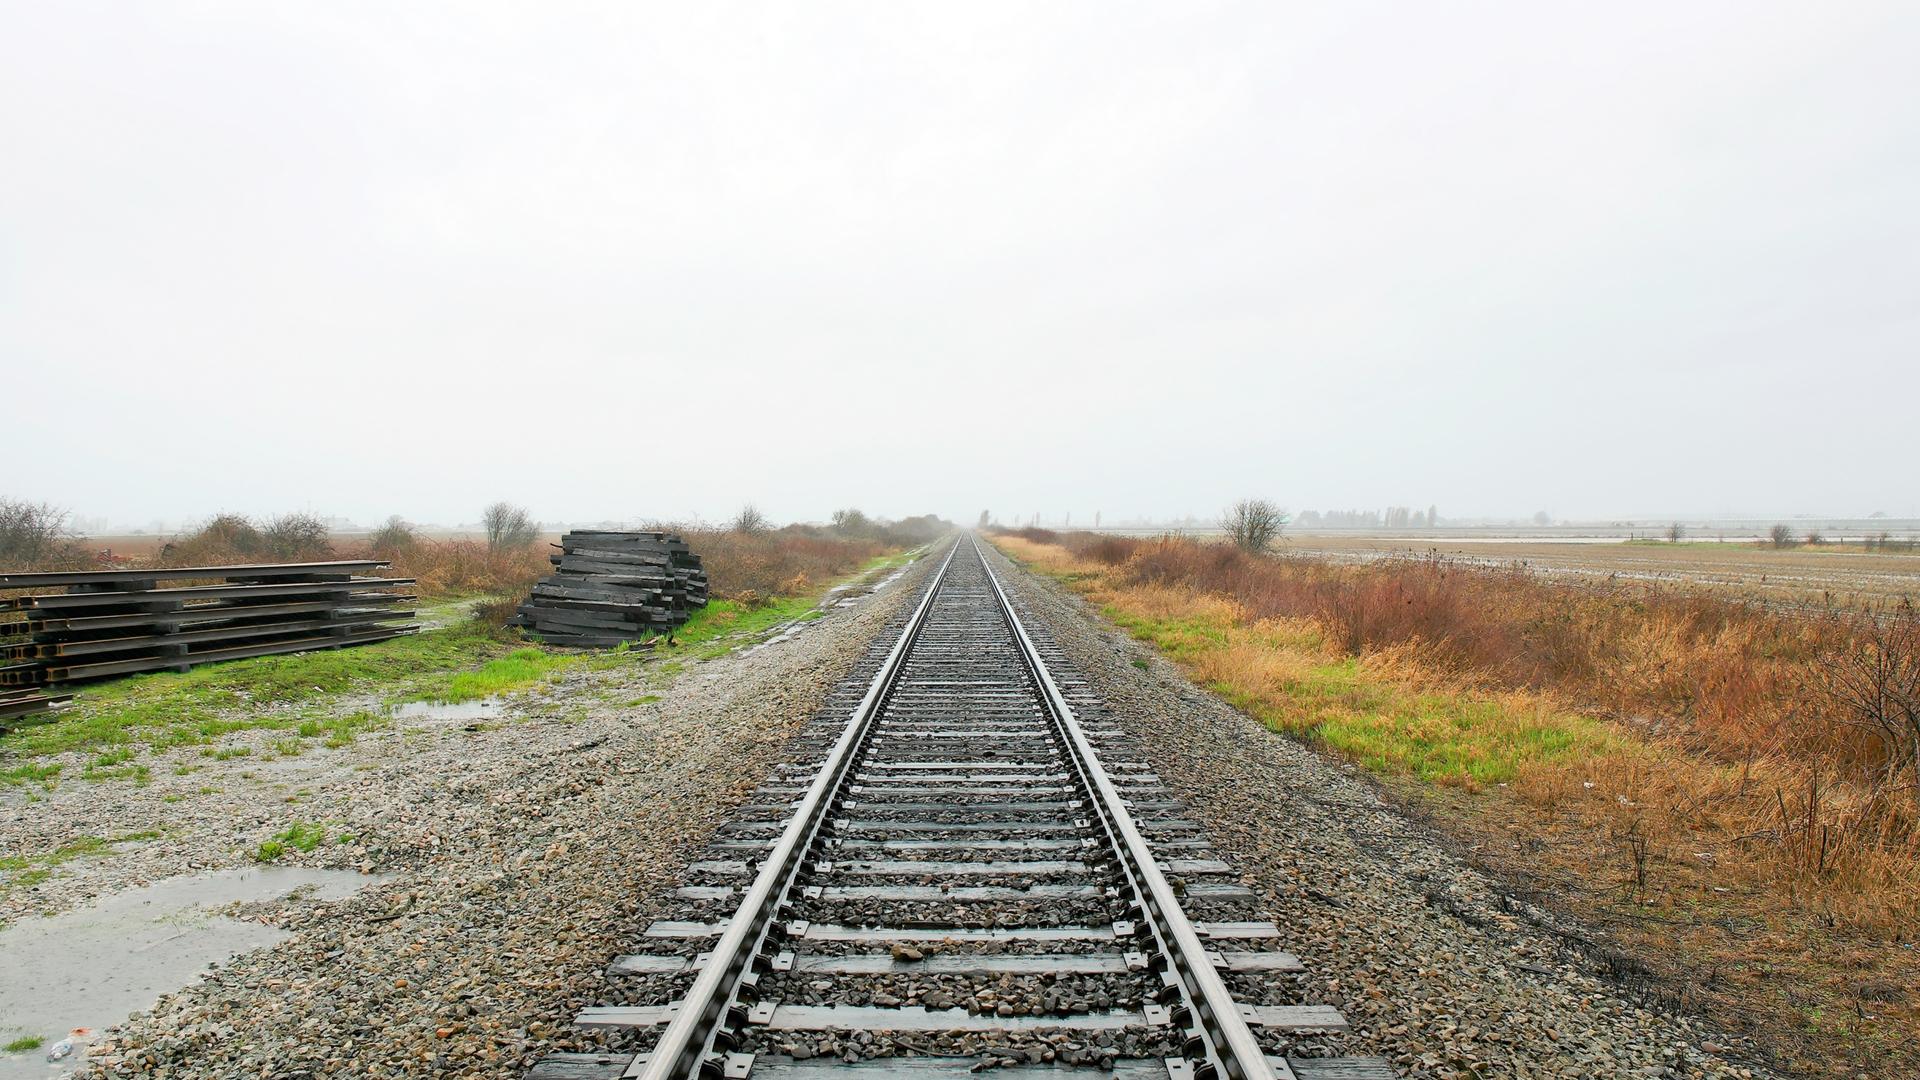 тужурках картинка железнодорожная ветка иркутске